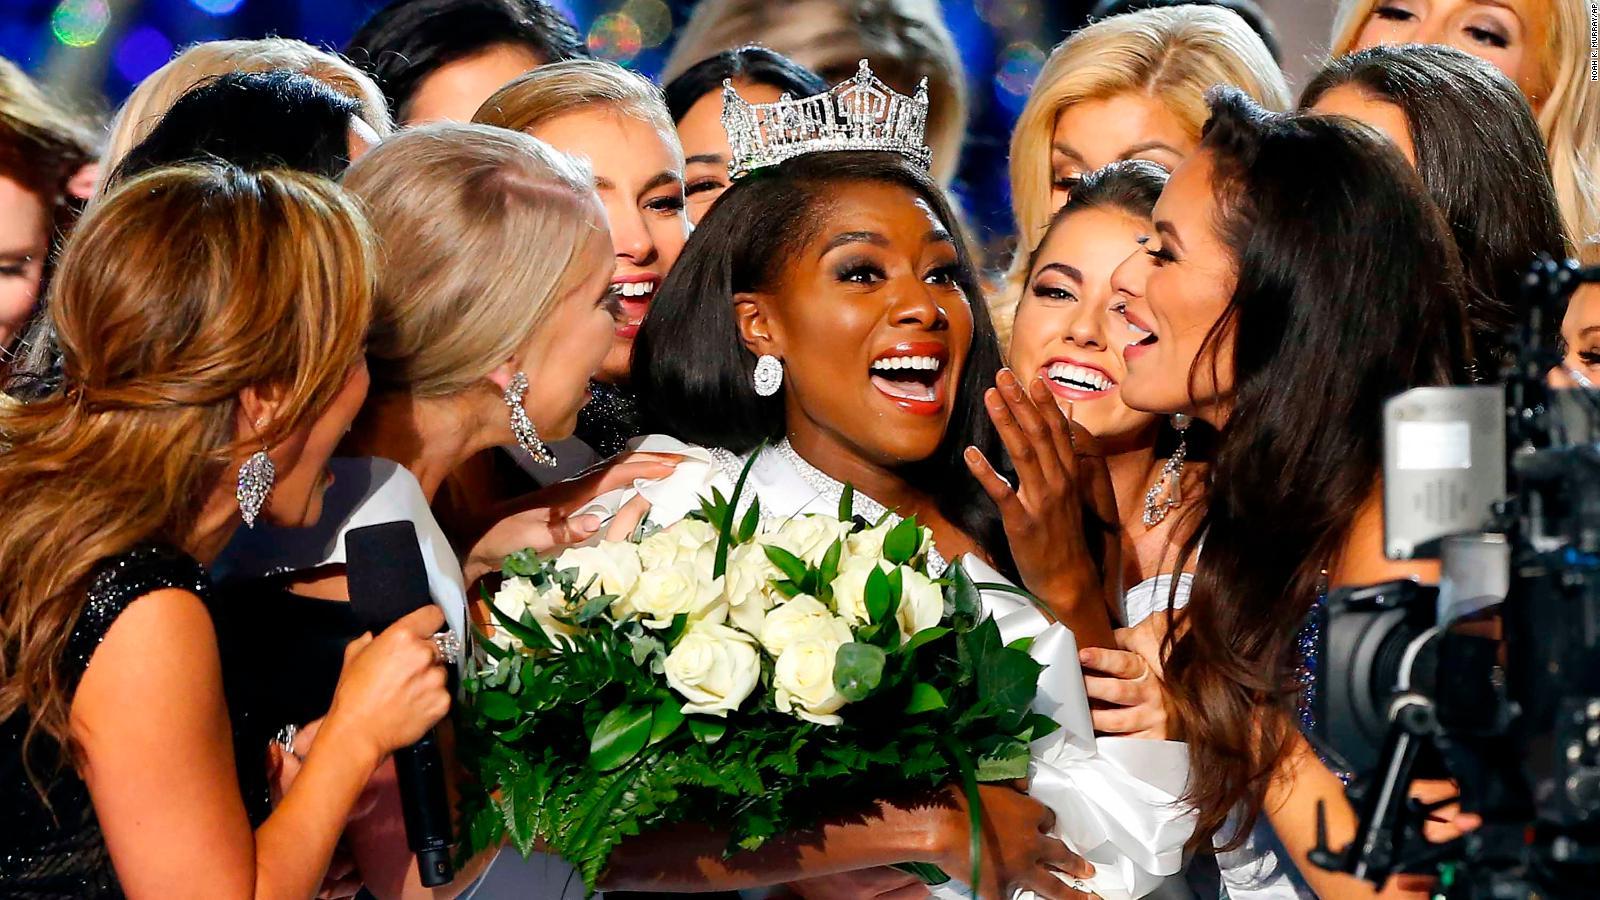 Jessy Erinn Biography miss new york crowned miss america 2019